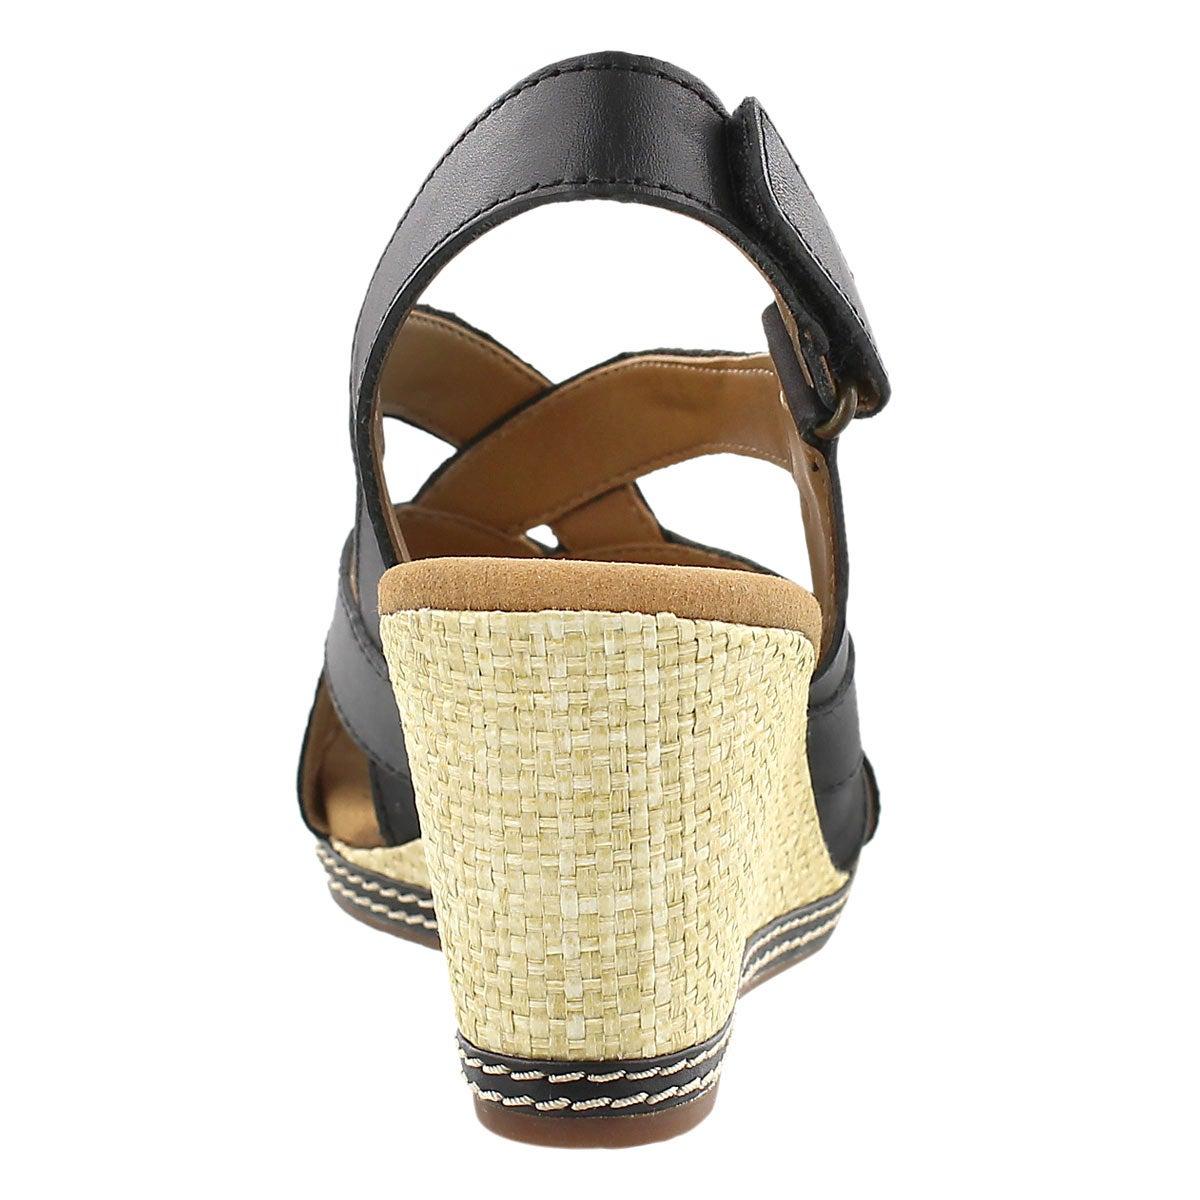 Lds Helio Coral black wedge sandal